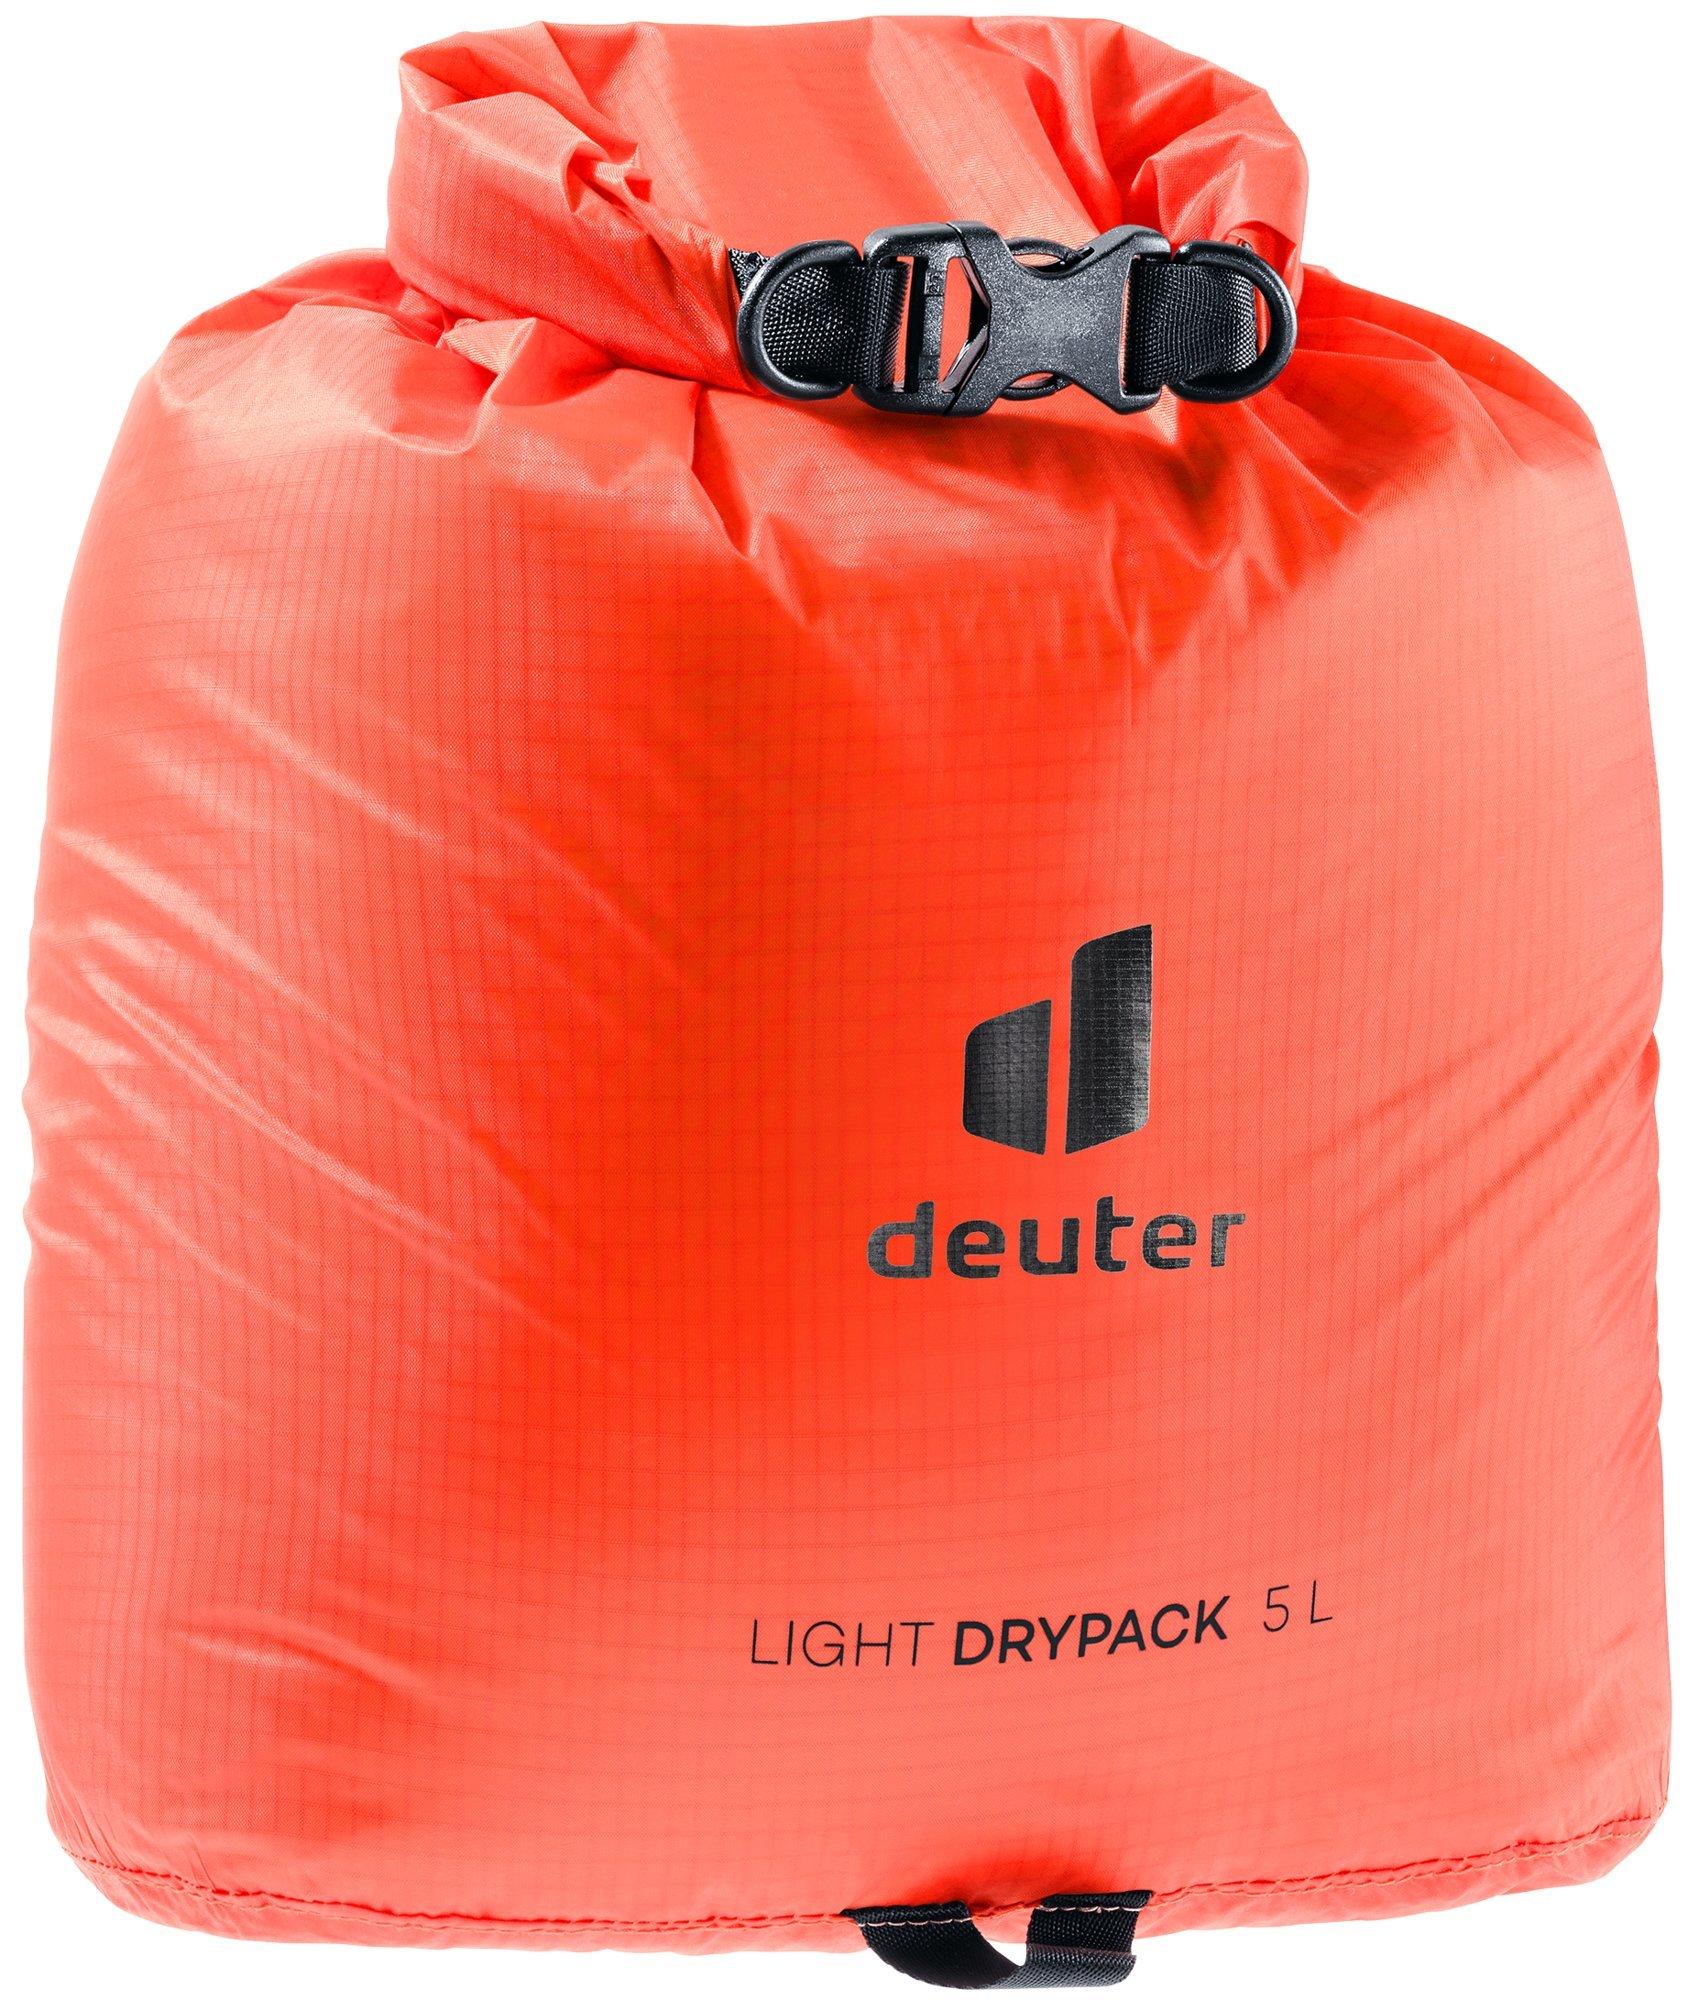 Гермомешки Гермомешок Deuter Light Drypack 5 0fb69deb693b48beabb082a7eb553a28.png